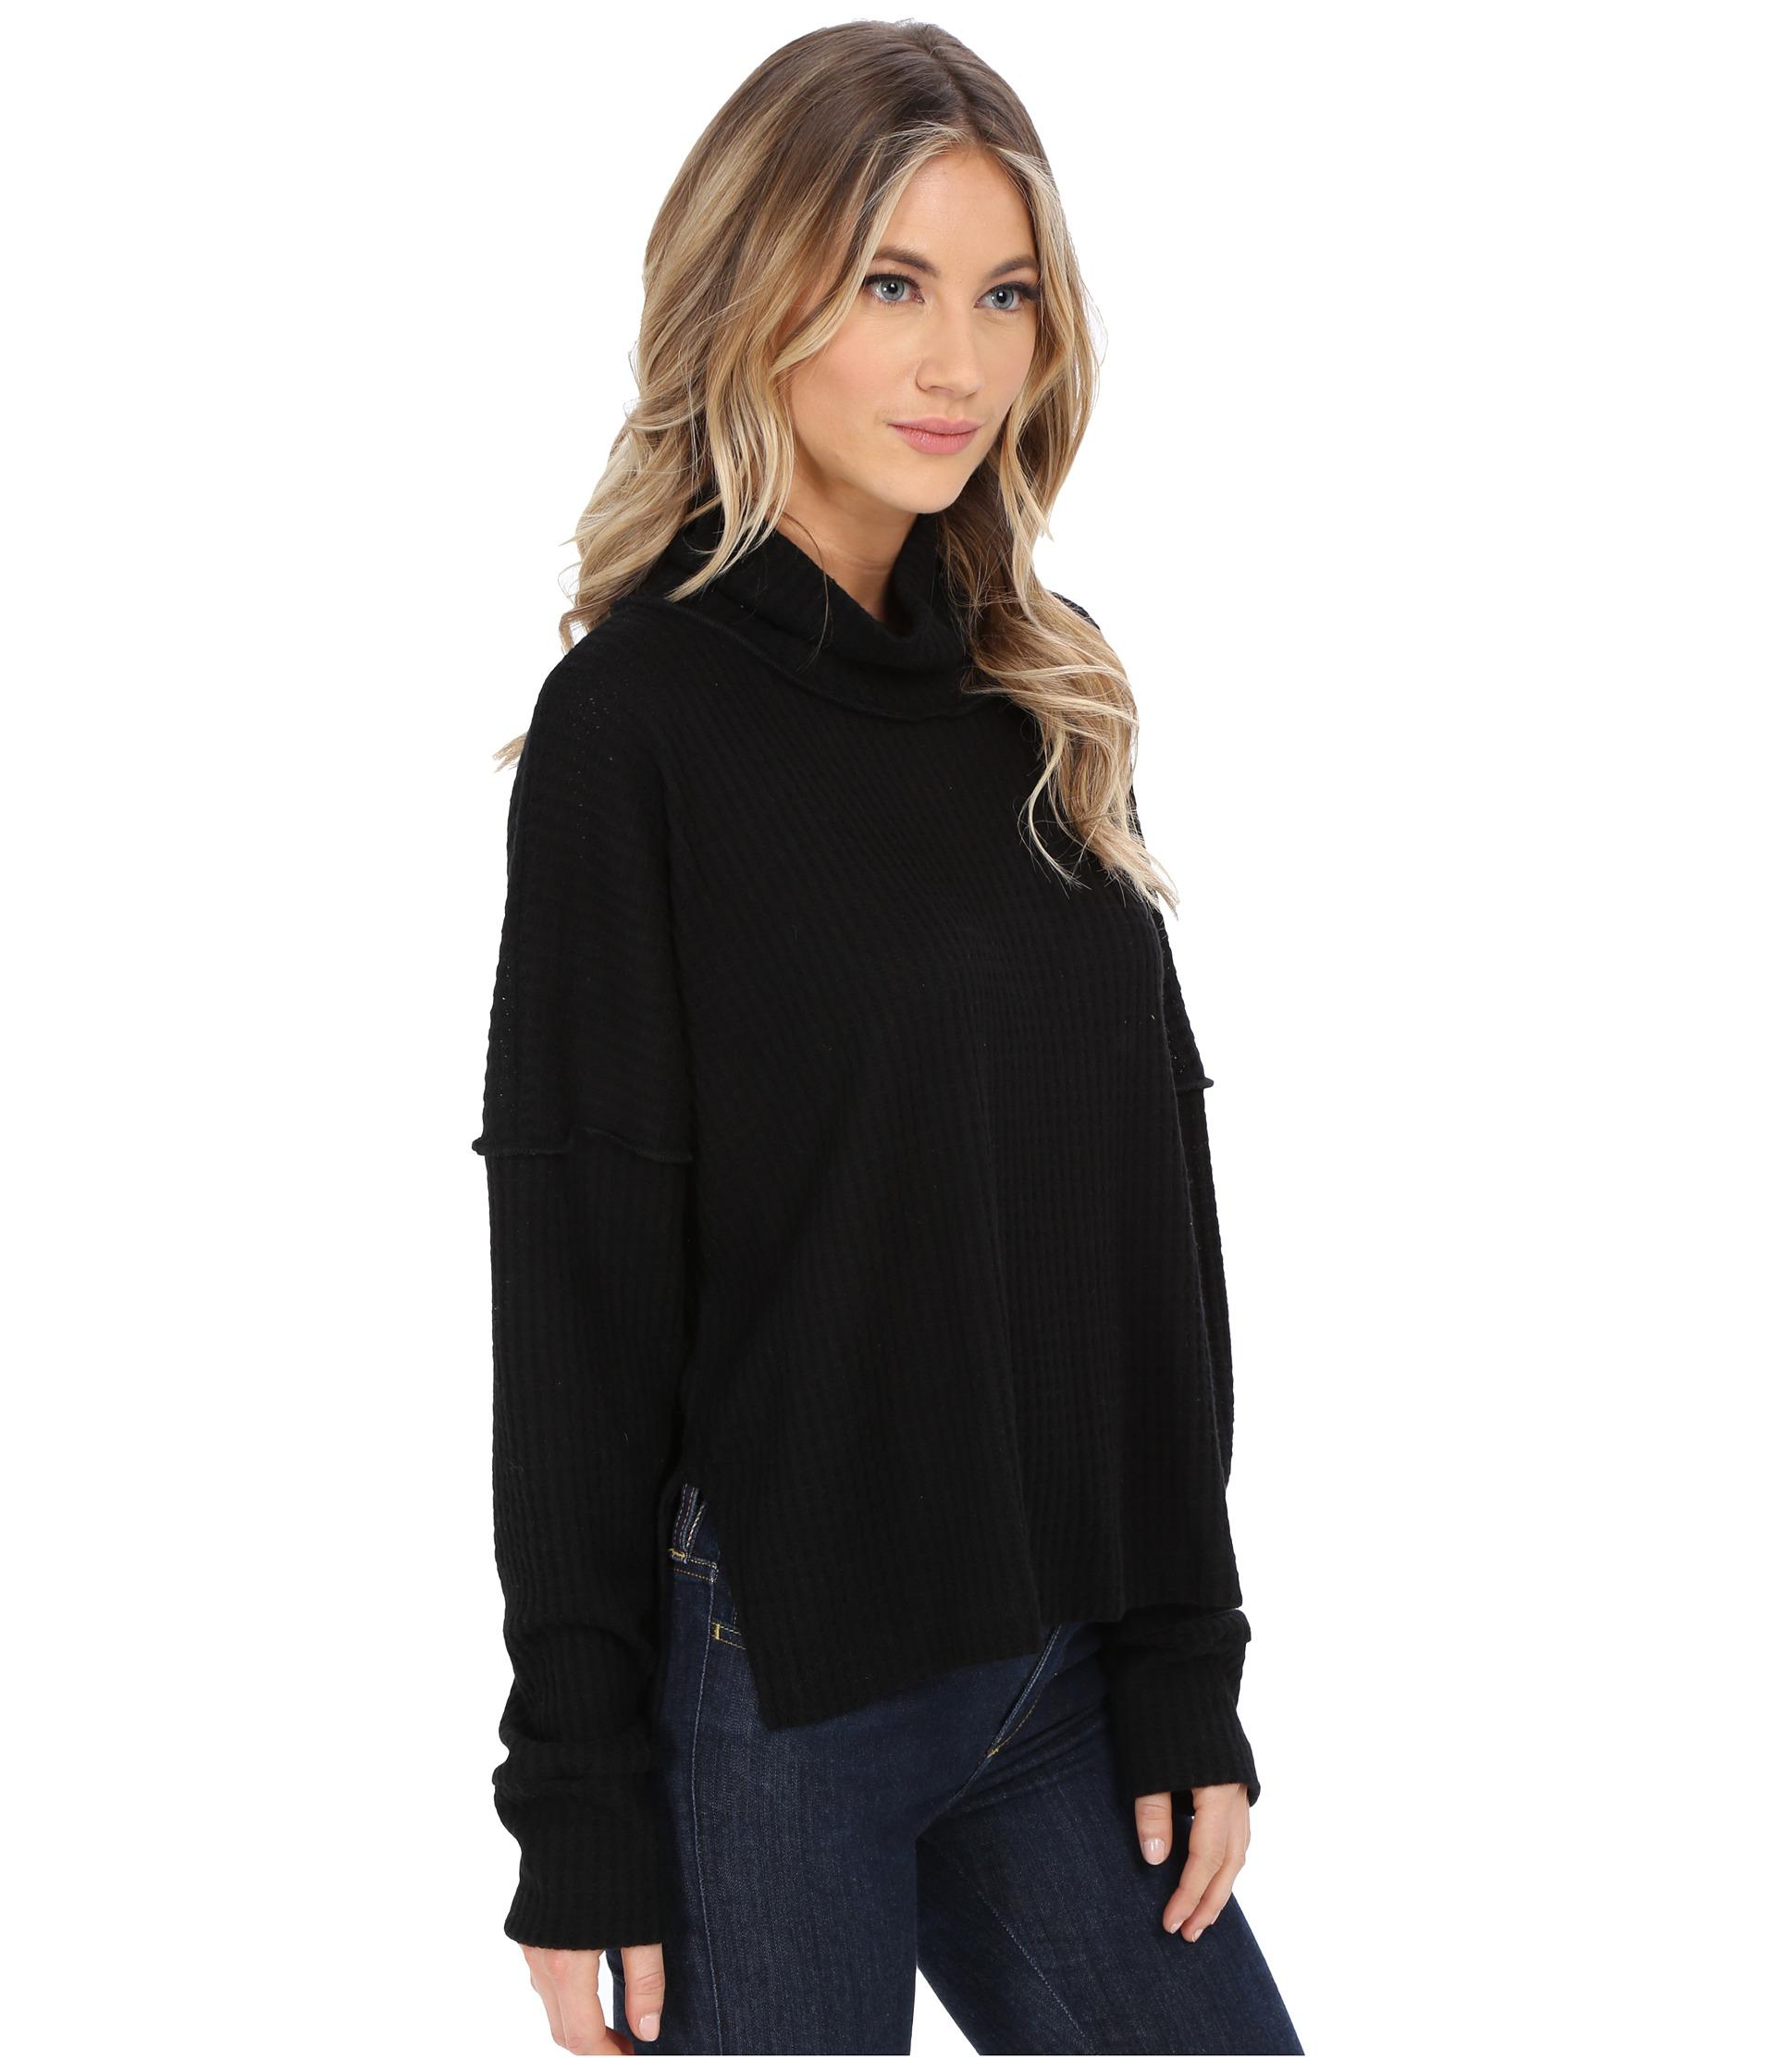 Lna Oversized Turtleneck Sweater in Black | Lyst